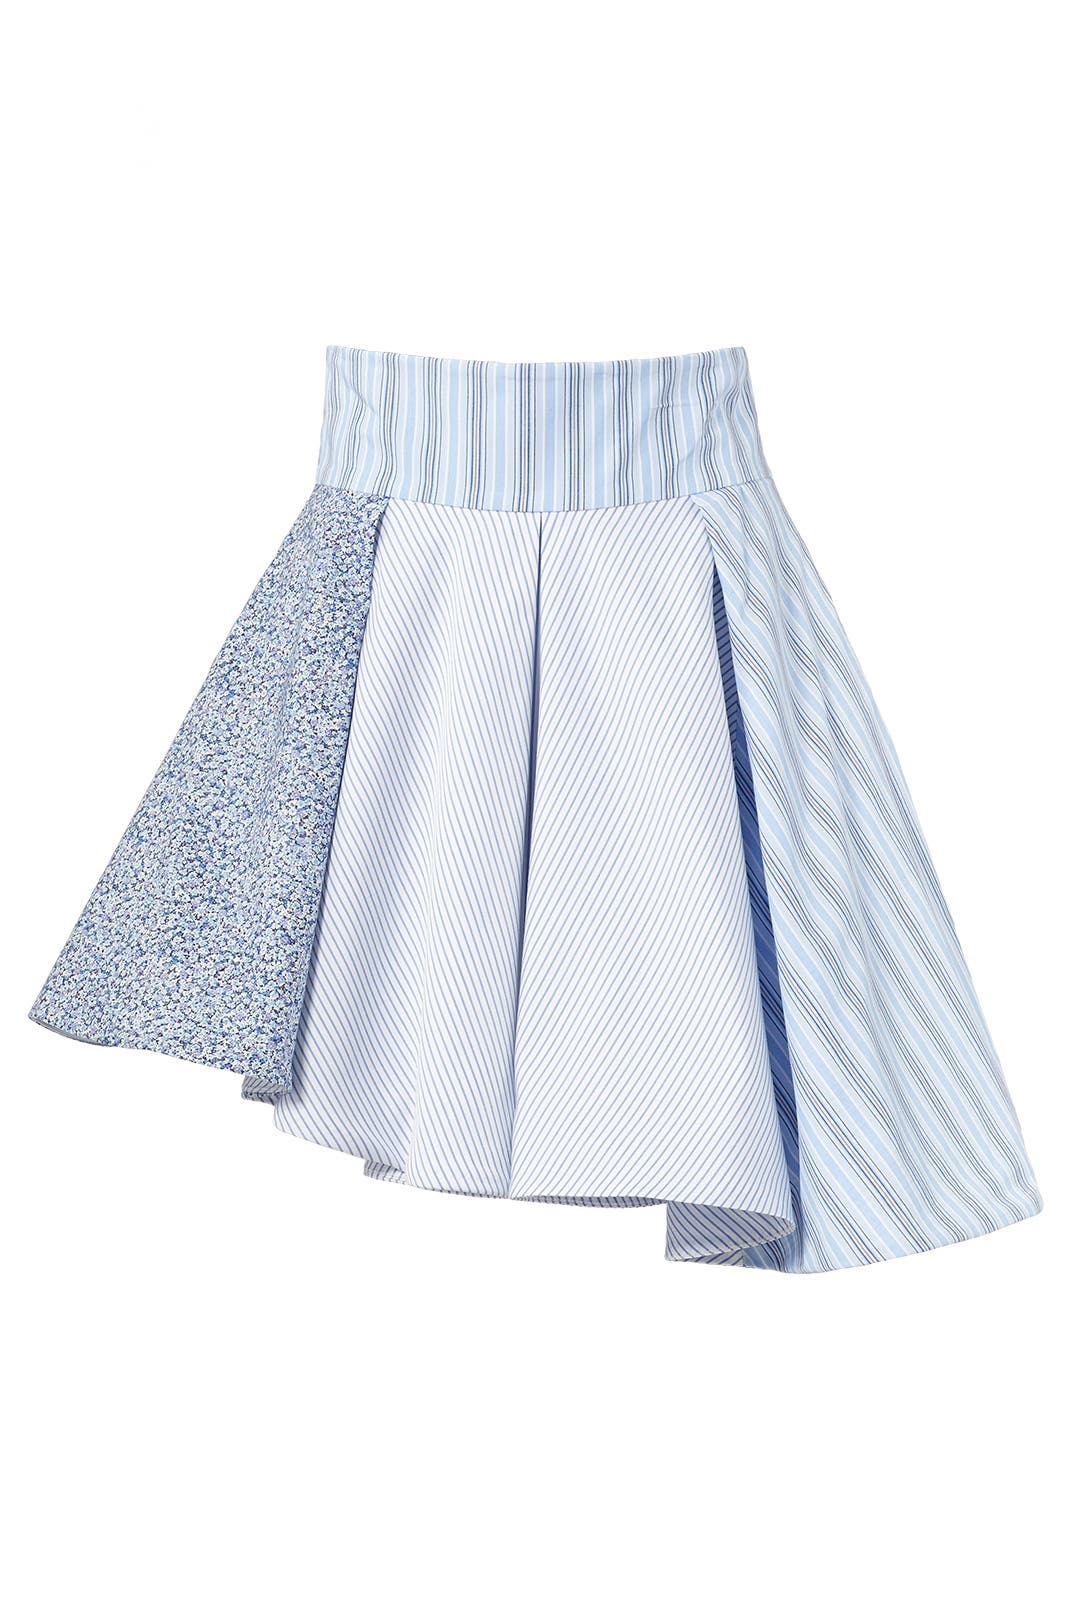 994d472c3a1 Petersyn. Read Reviews. Captiva Print Tinsley Skirt